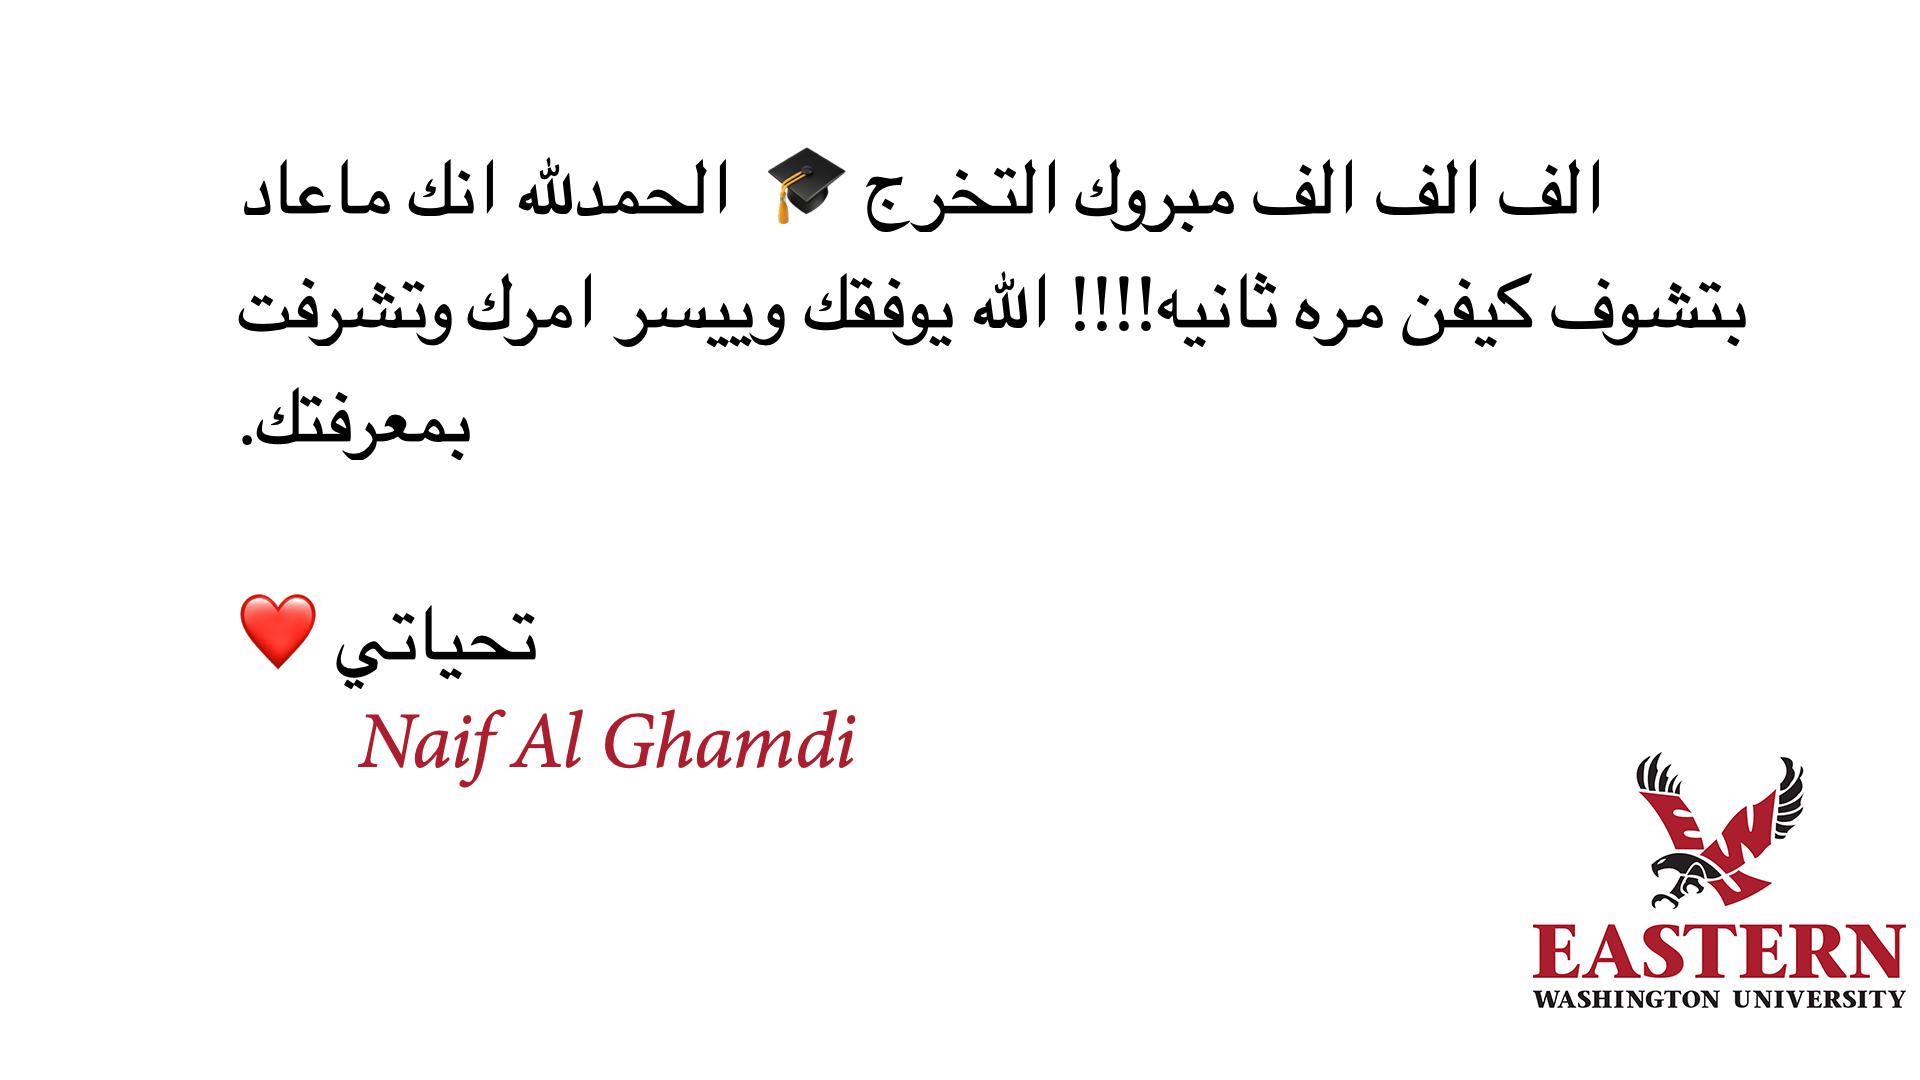 tbi_abdulwahab-ali-a-alanazi_4710.png